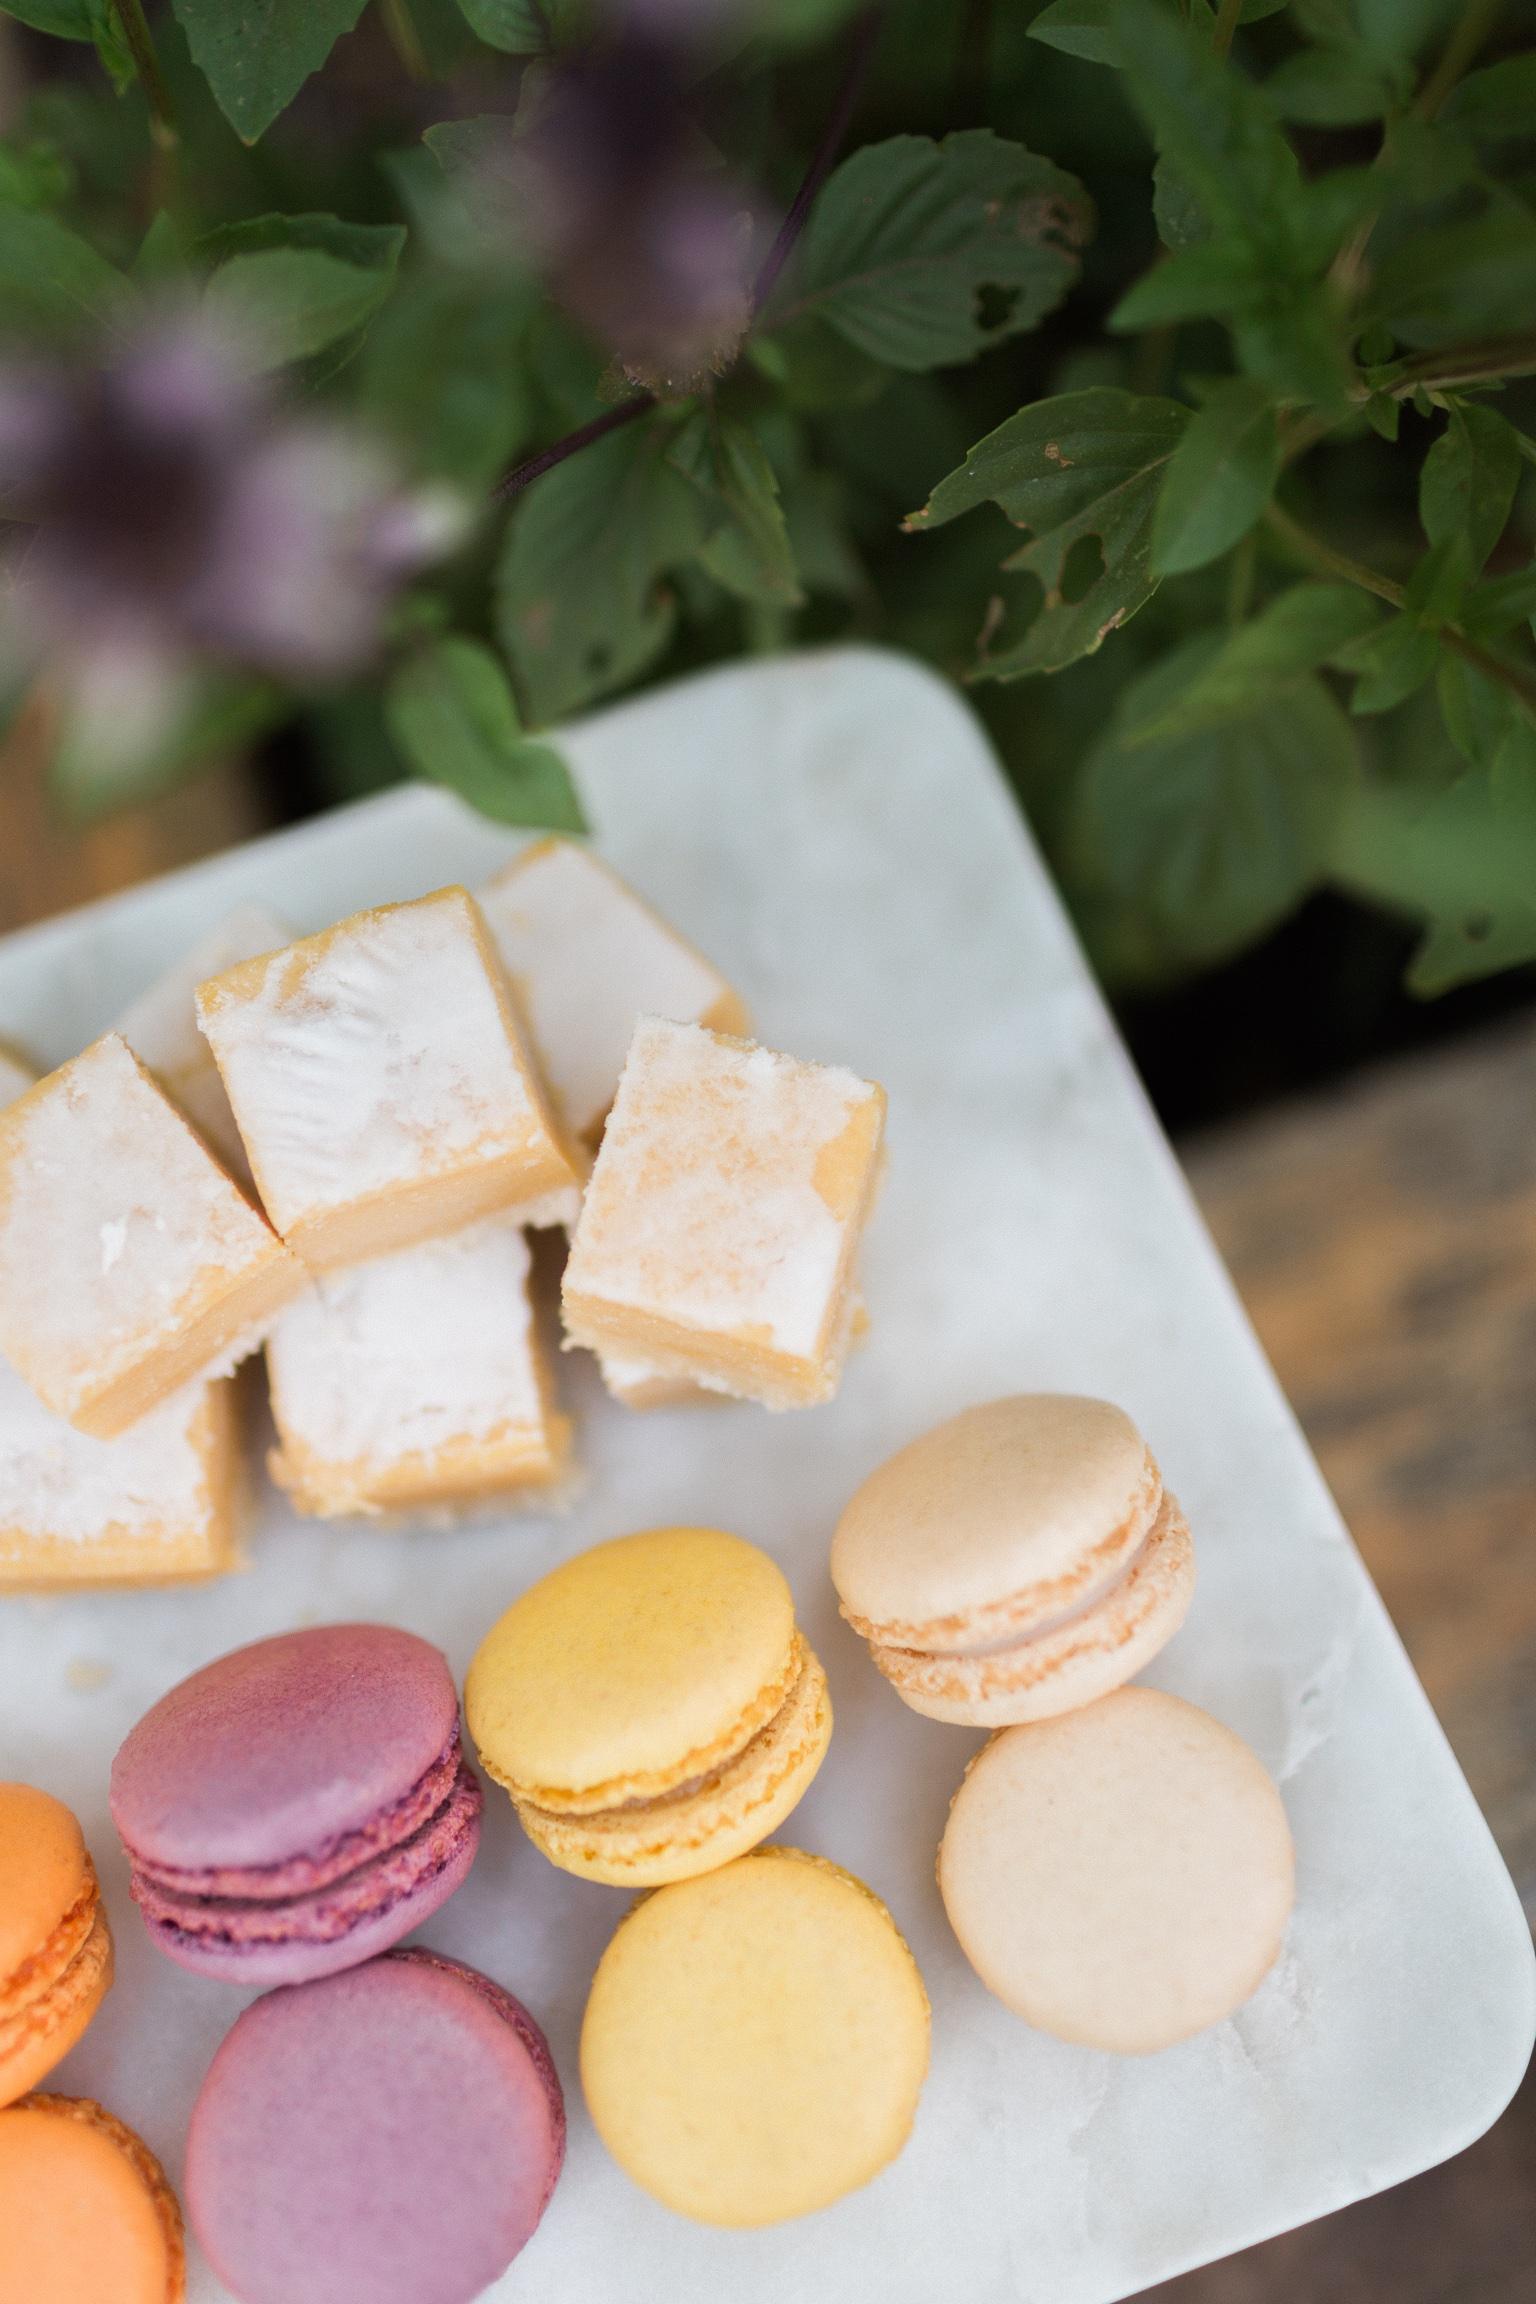 Great Tips for Bad Bakers: Buy these lemon bars and macarons at Trader Joe's